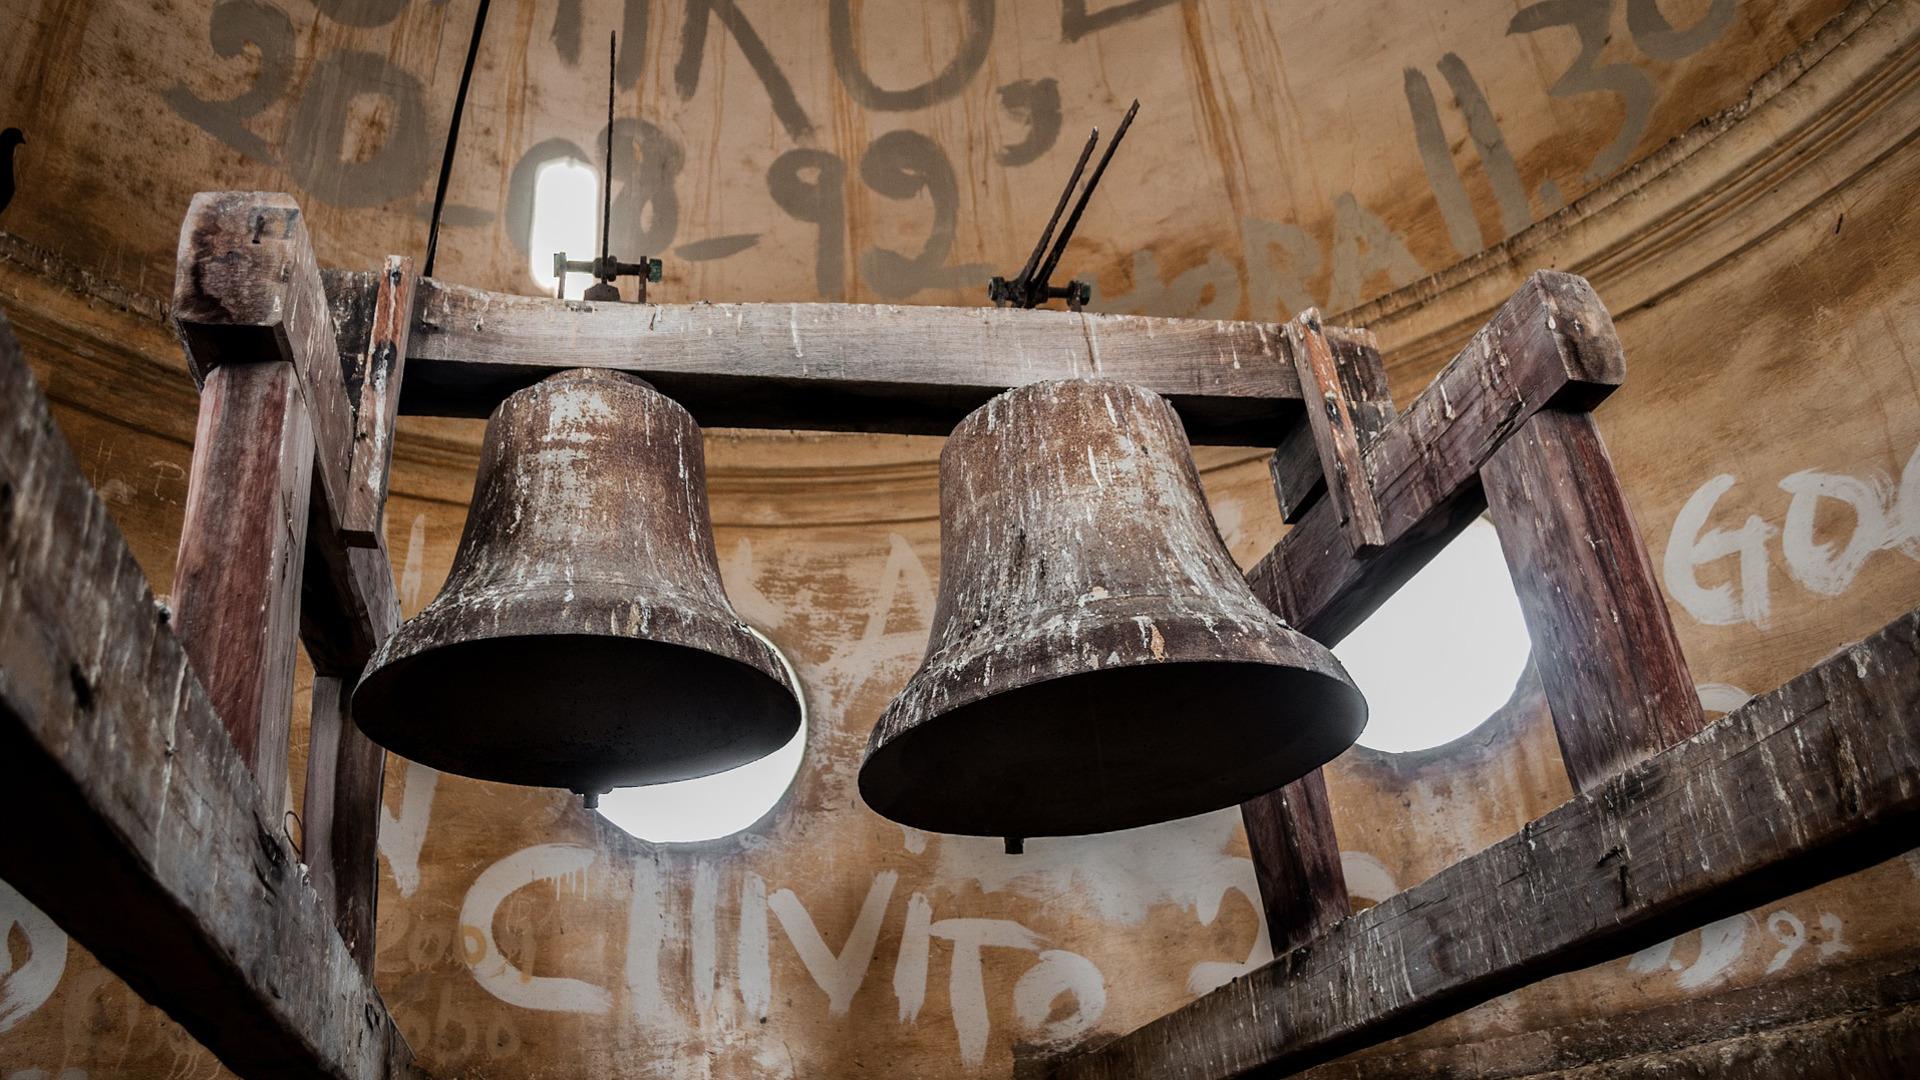 Glocken in der Basilika in Chiquinquira